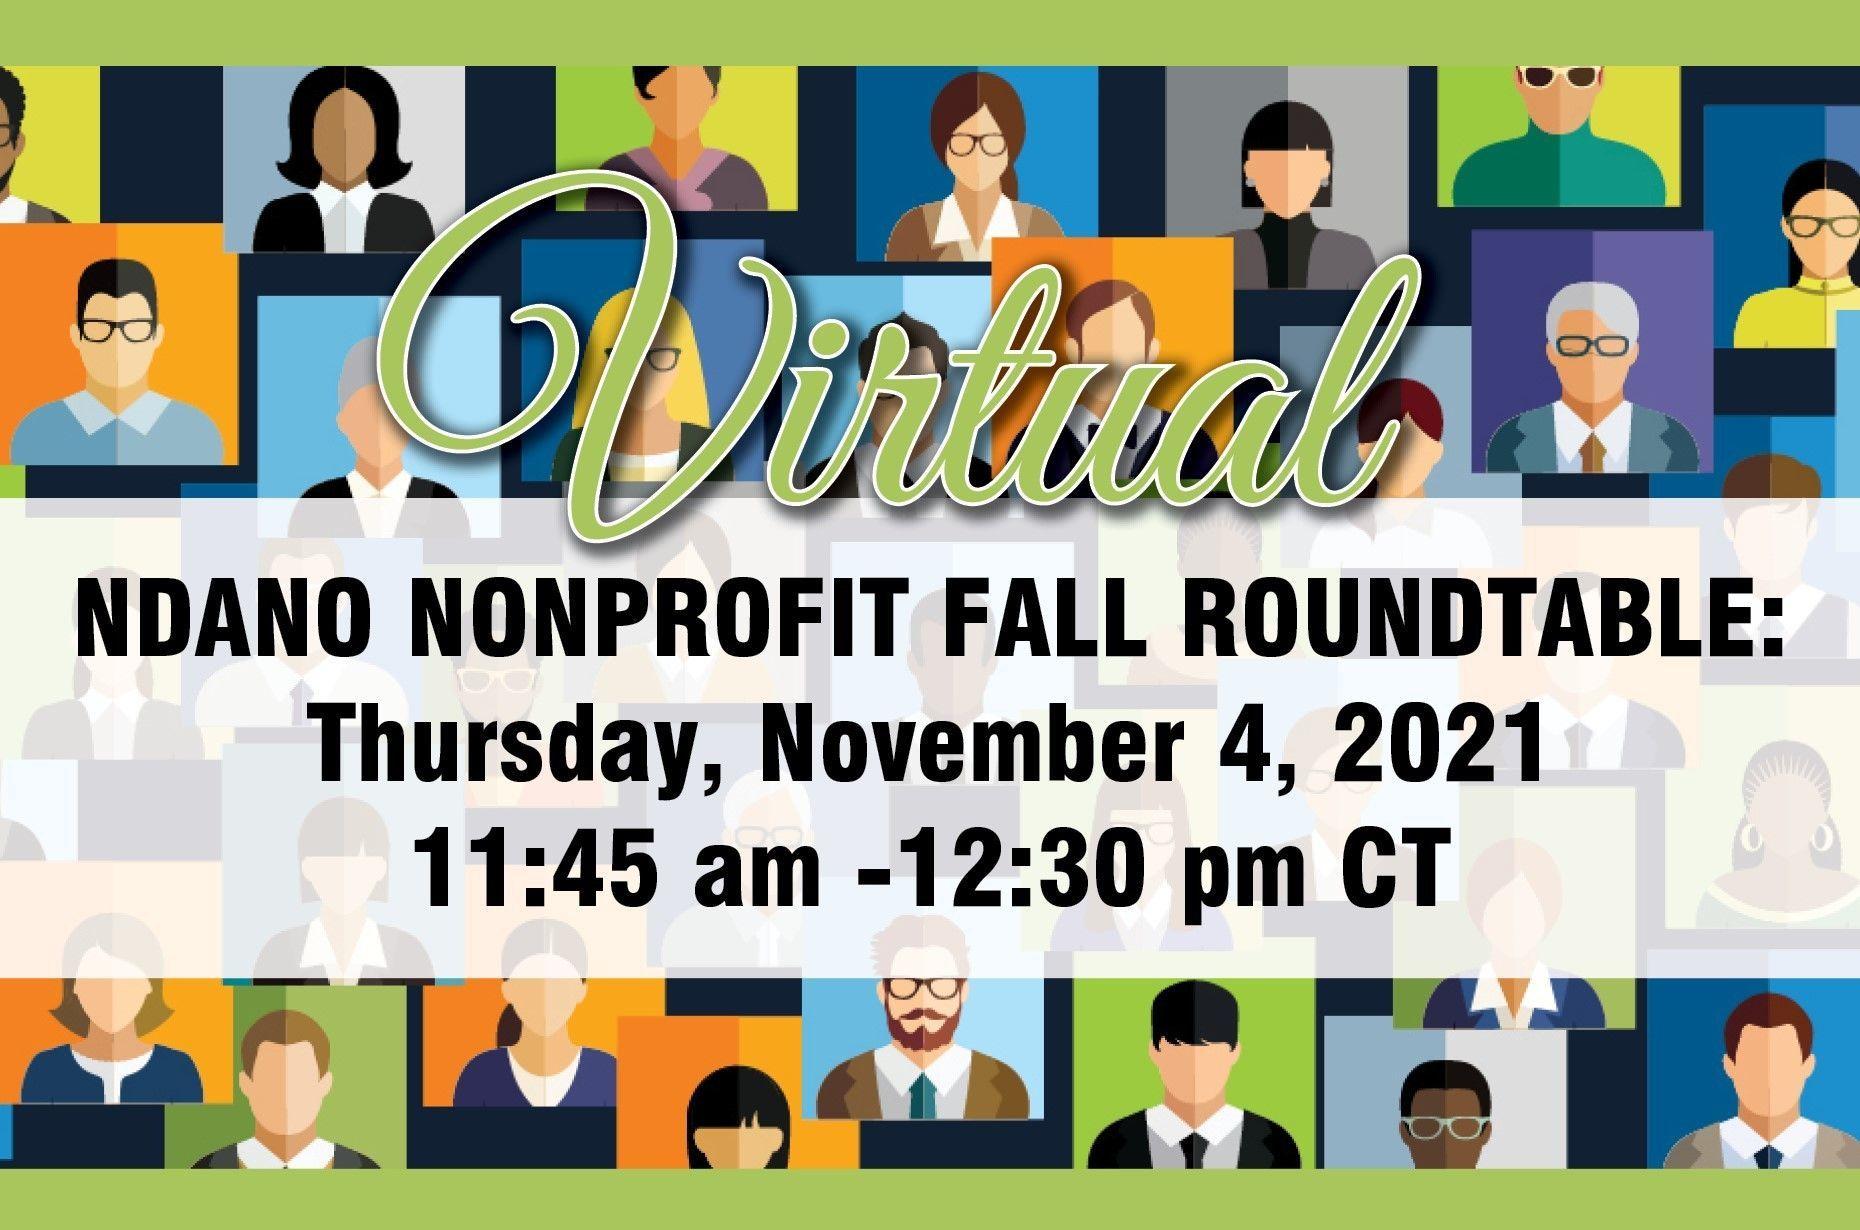 NDANO Nonprofit Fall Roundtable